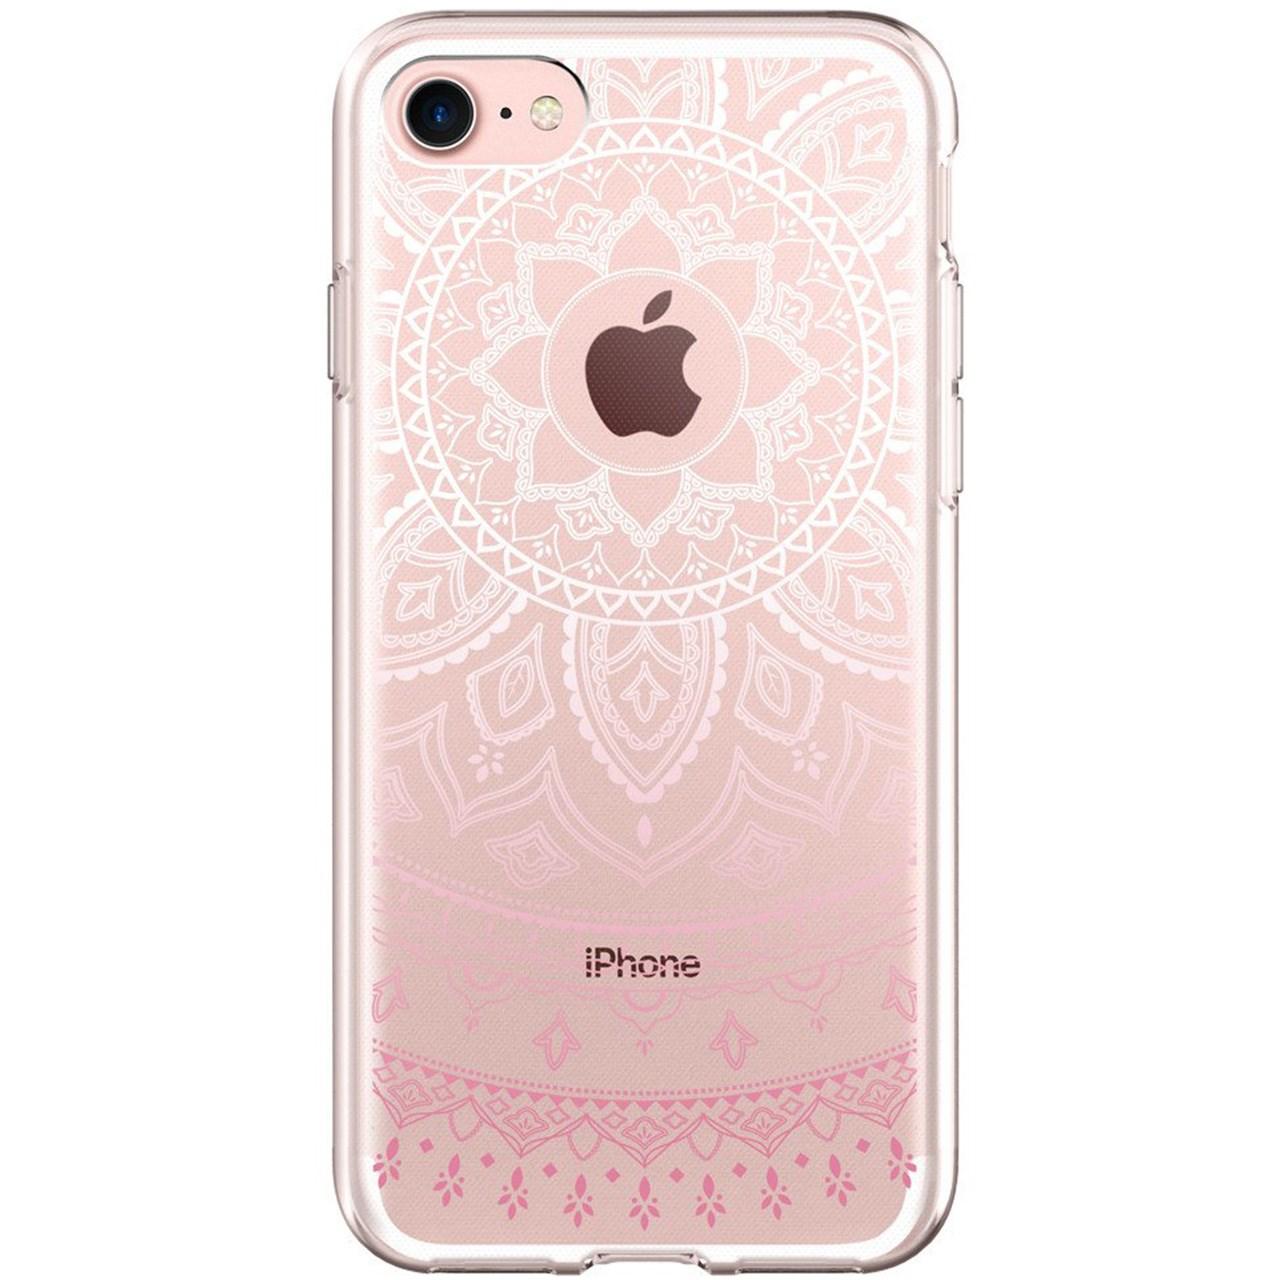 کاور اسپیگن مدل Liquid Crystal pattern مناسب برای گوشی موبایل آیفون 7